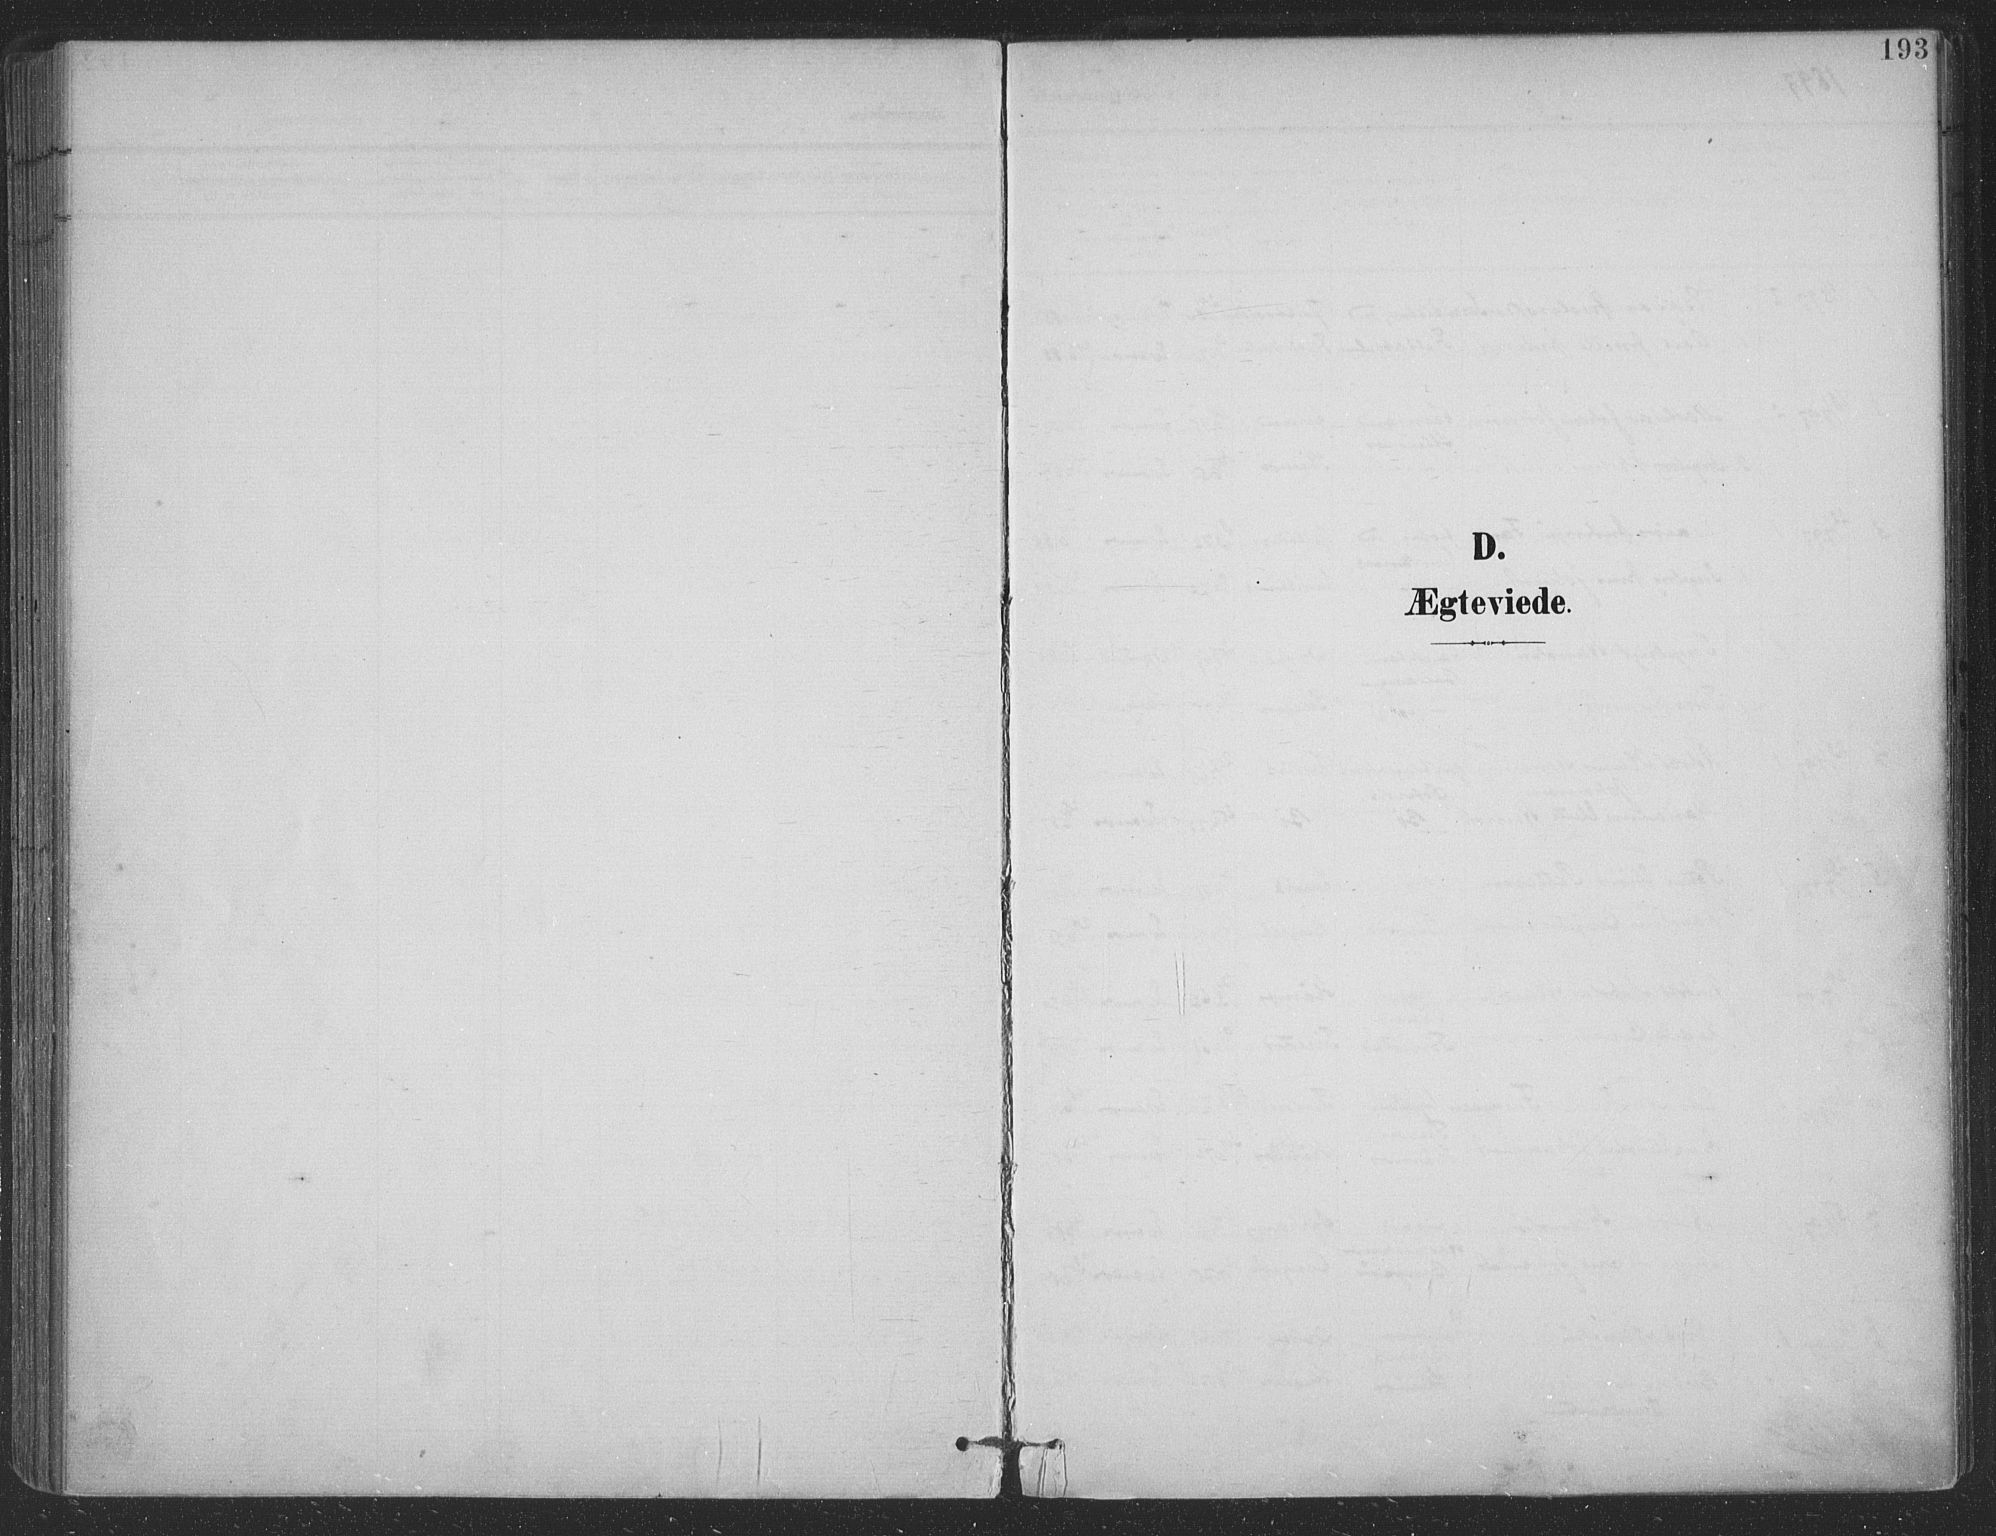 SAT, Ministerialprotokoller, klokkerbøker og fødselsregistre - Nordland, 863/L0899: Ministerialbok nr. 863A11, 1897-1906, s. 193